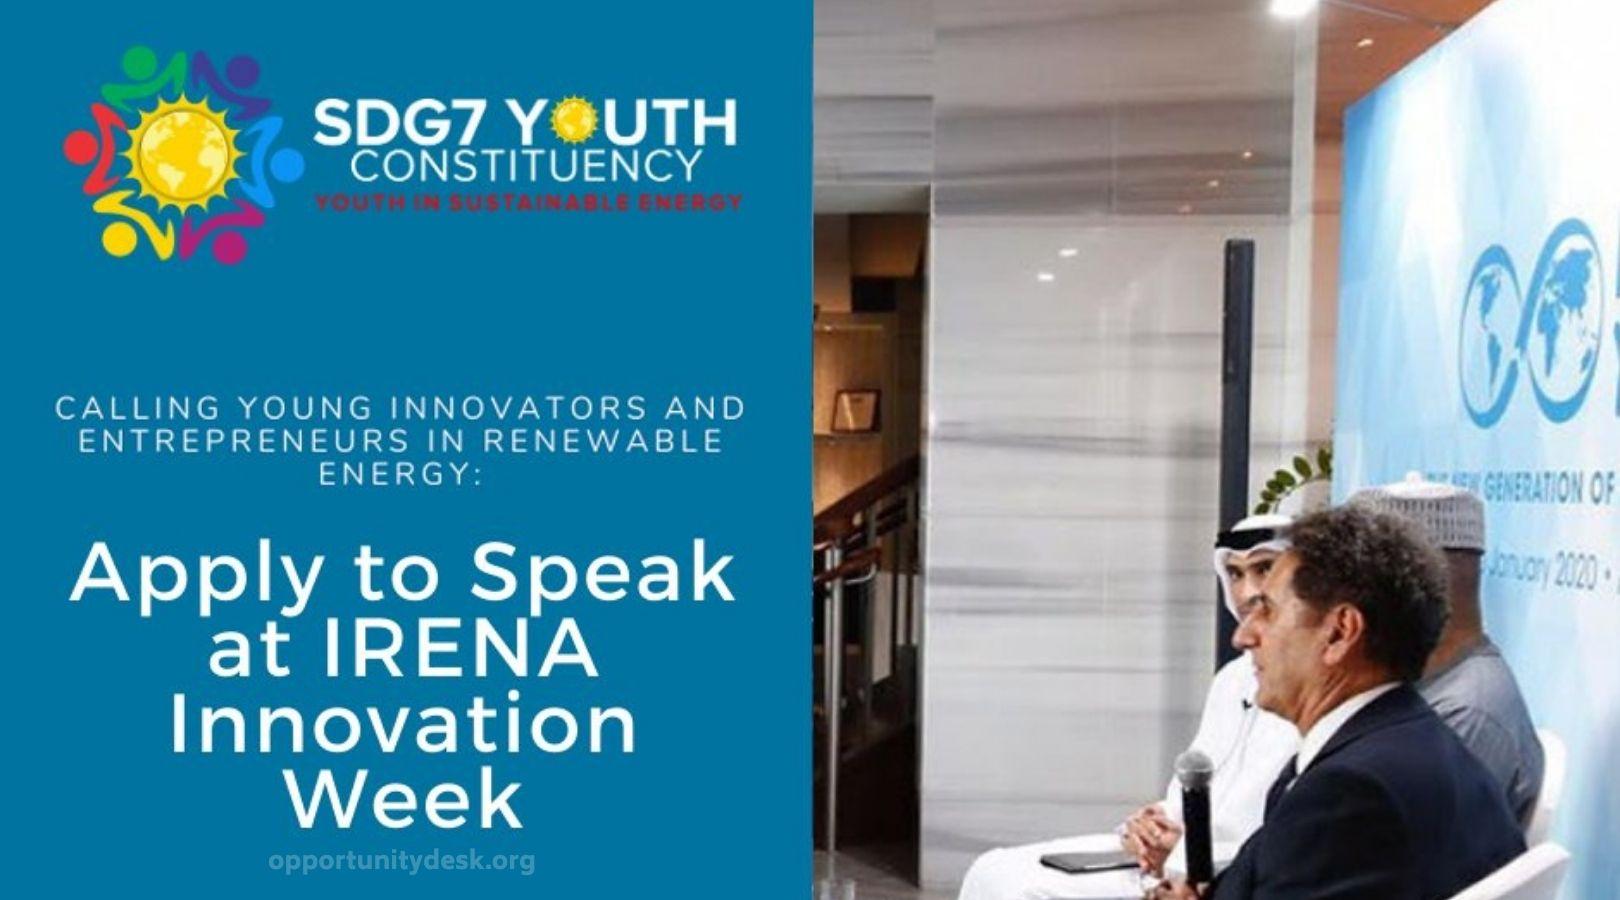 Apply to speak at IRENA Innovation Week 2020